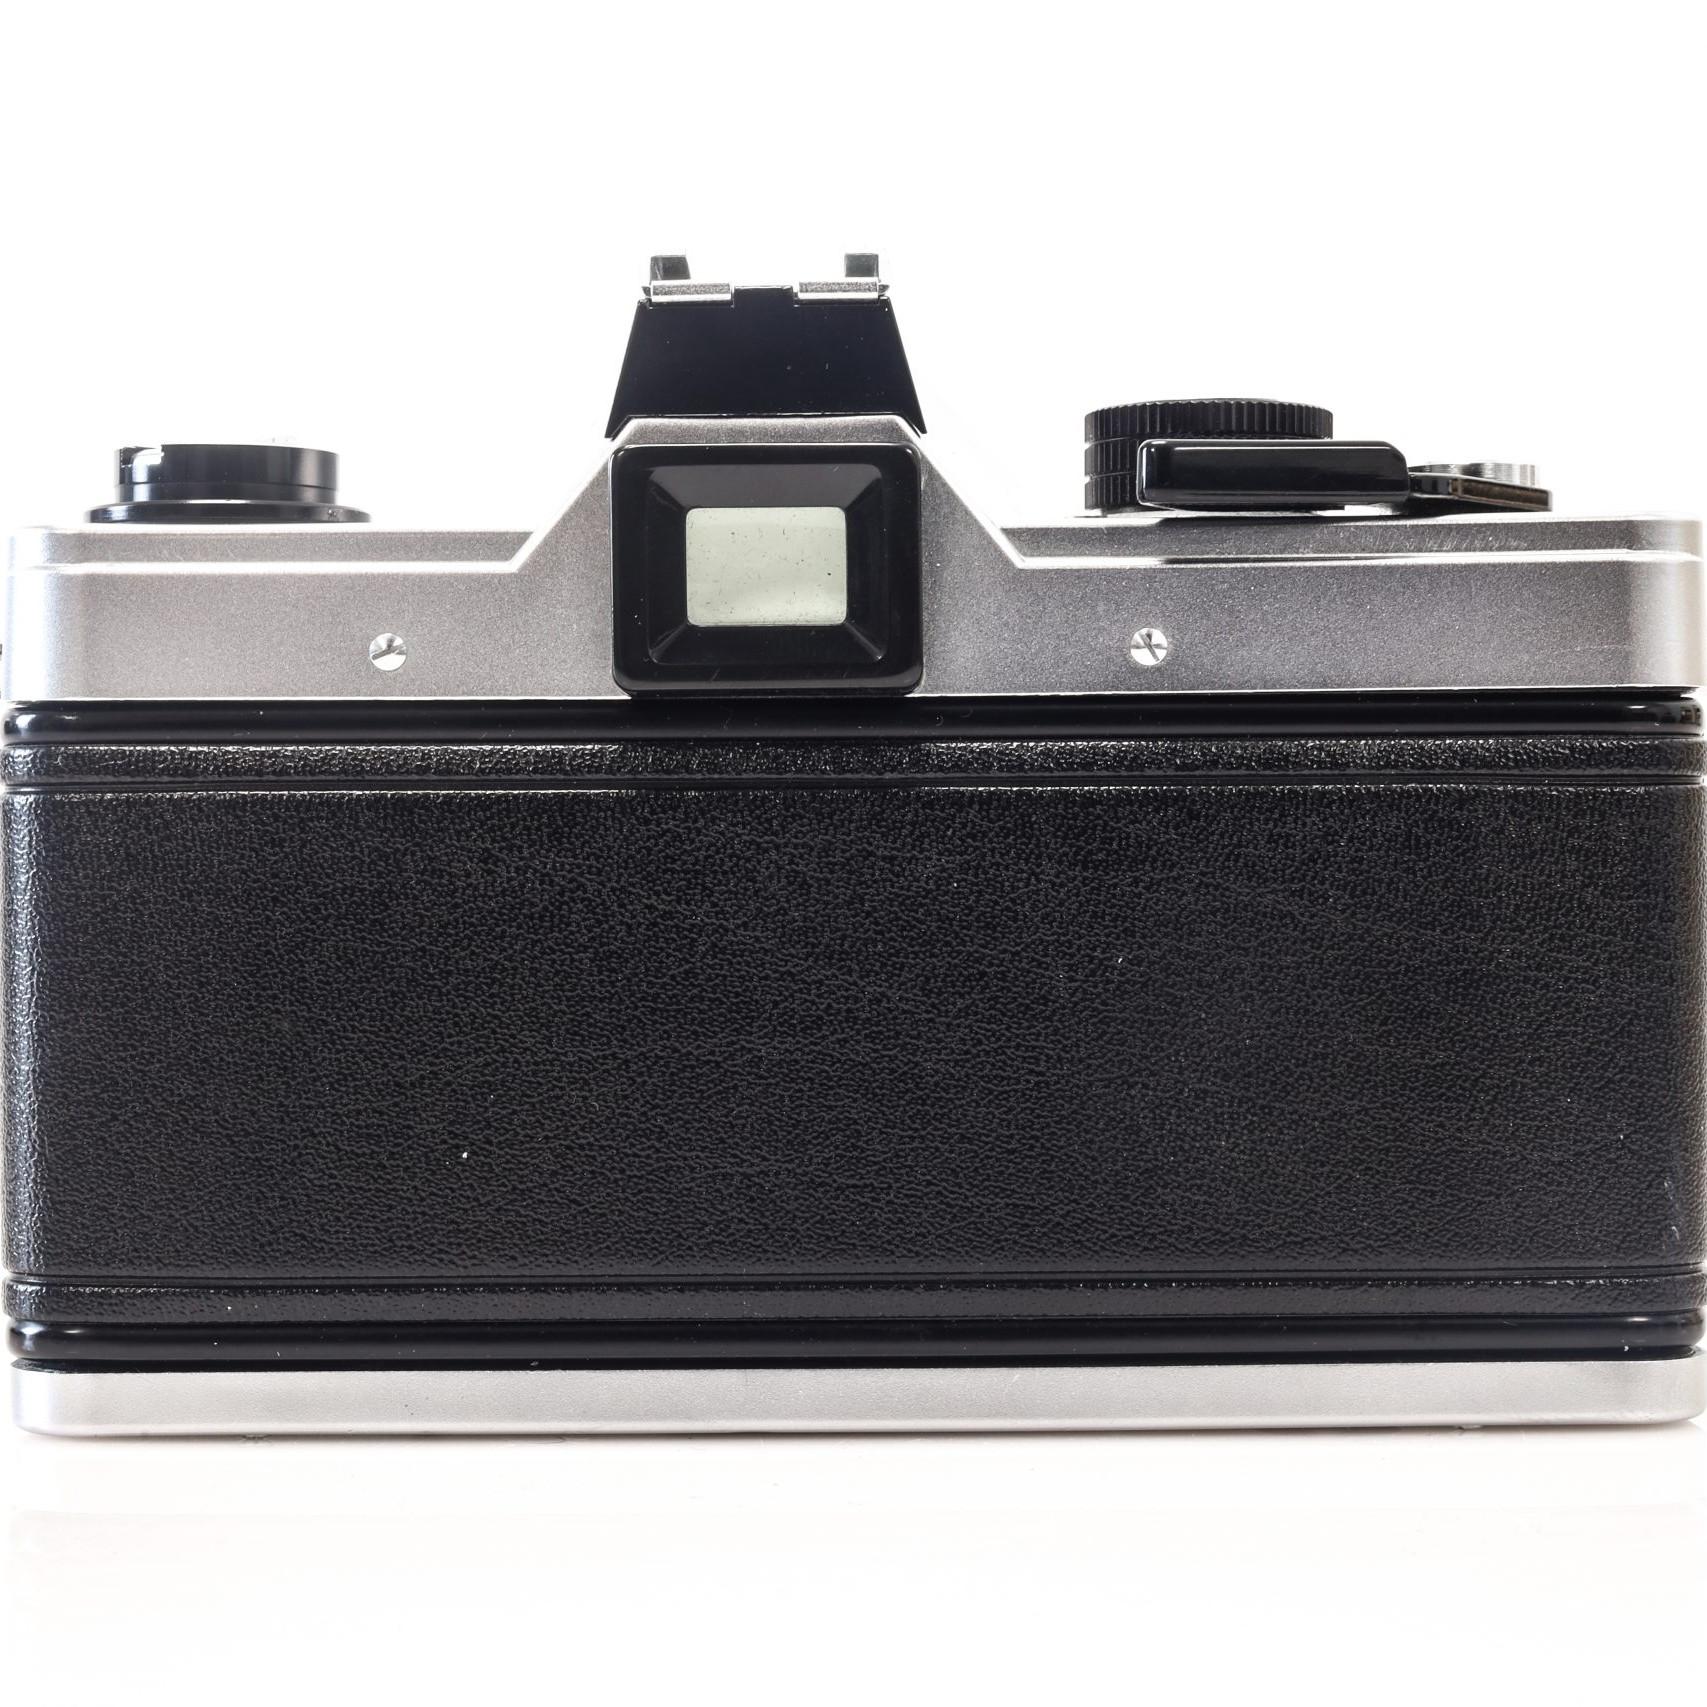 Beautiful Praktica Super TL 35mm Film Camera with 50mm F1.8 Lens